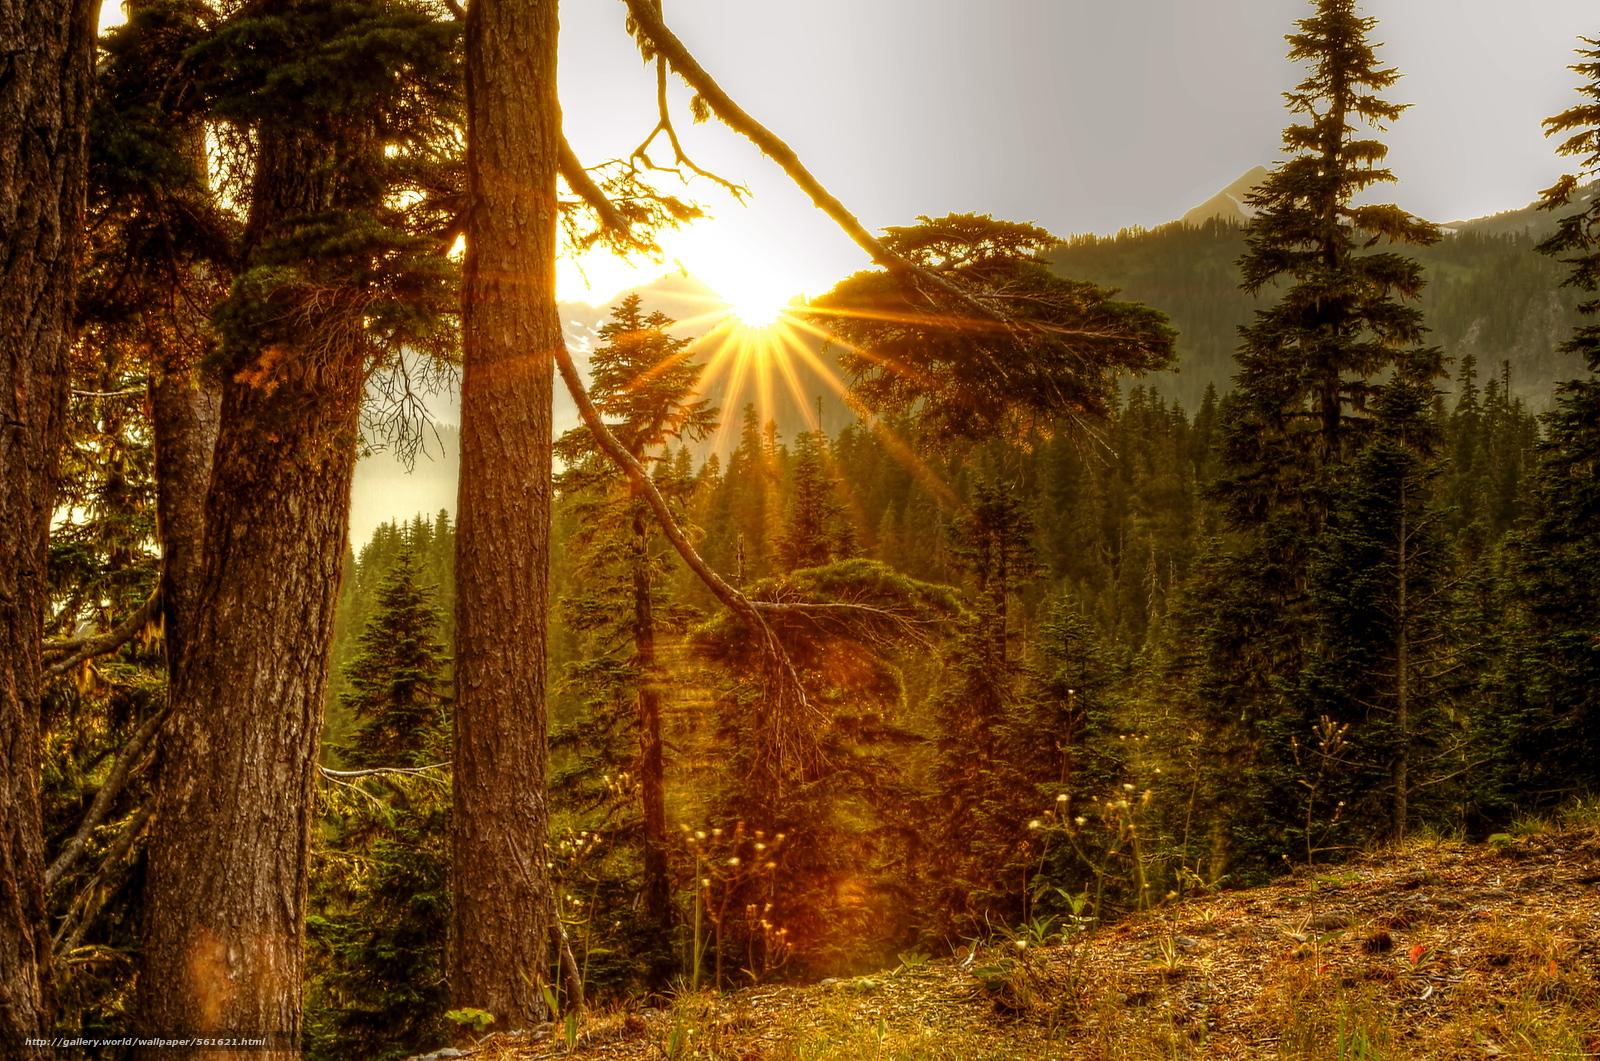 Sunce izlasci i zalasci - Page 6 56162110